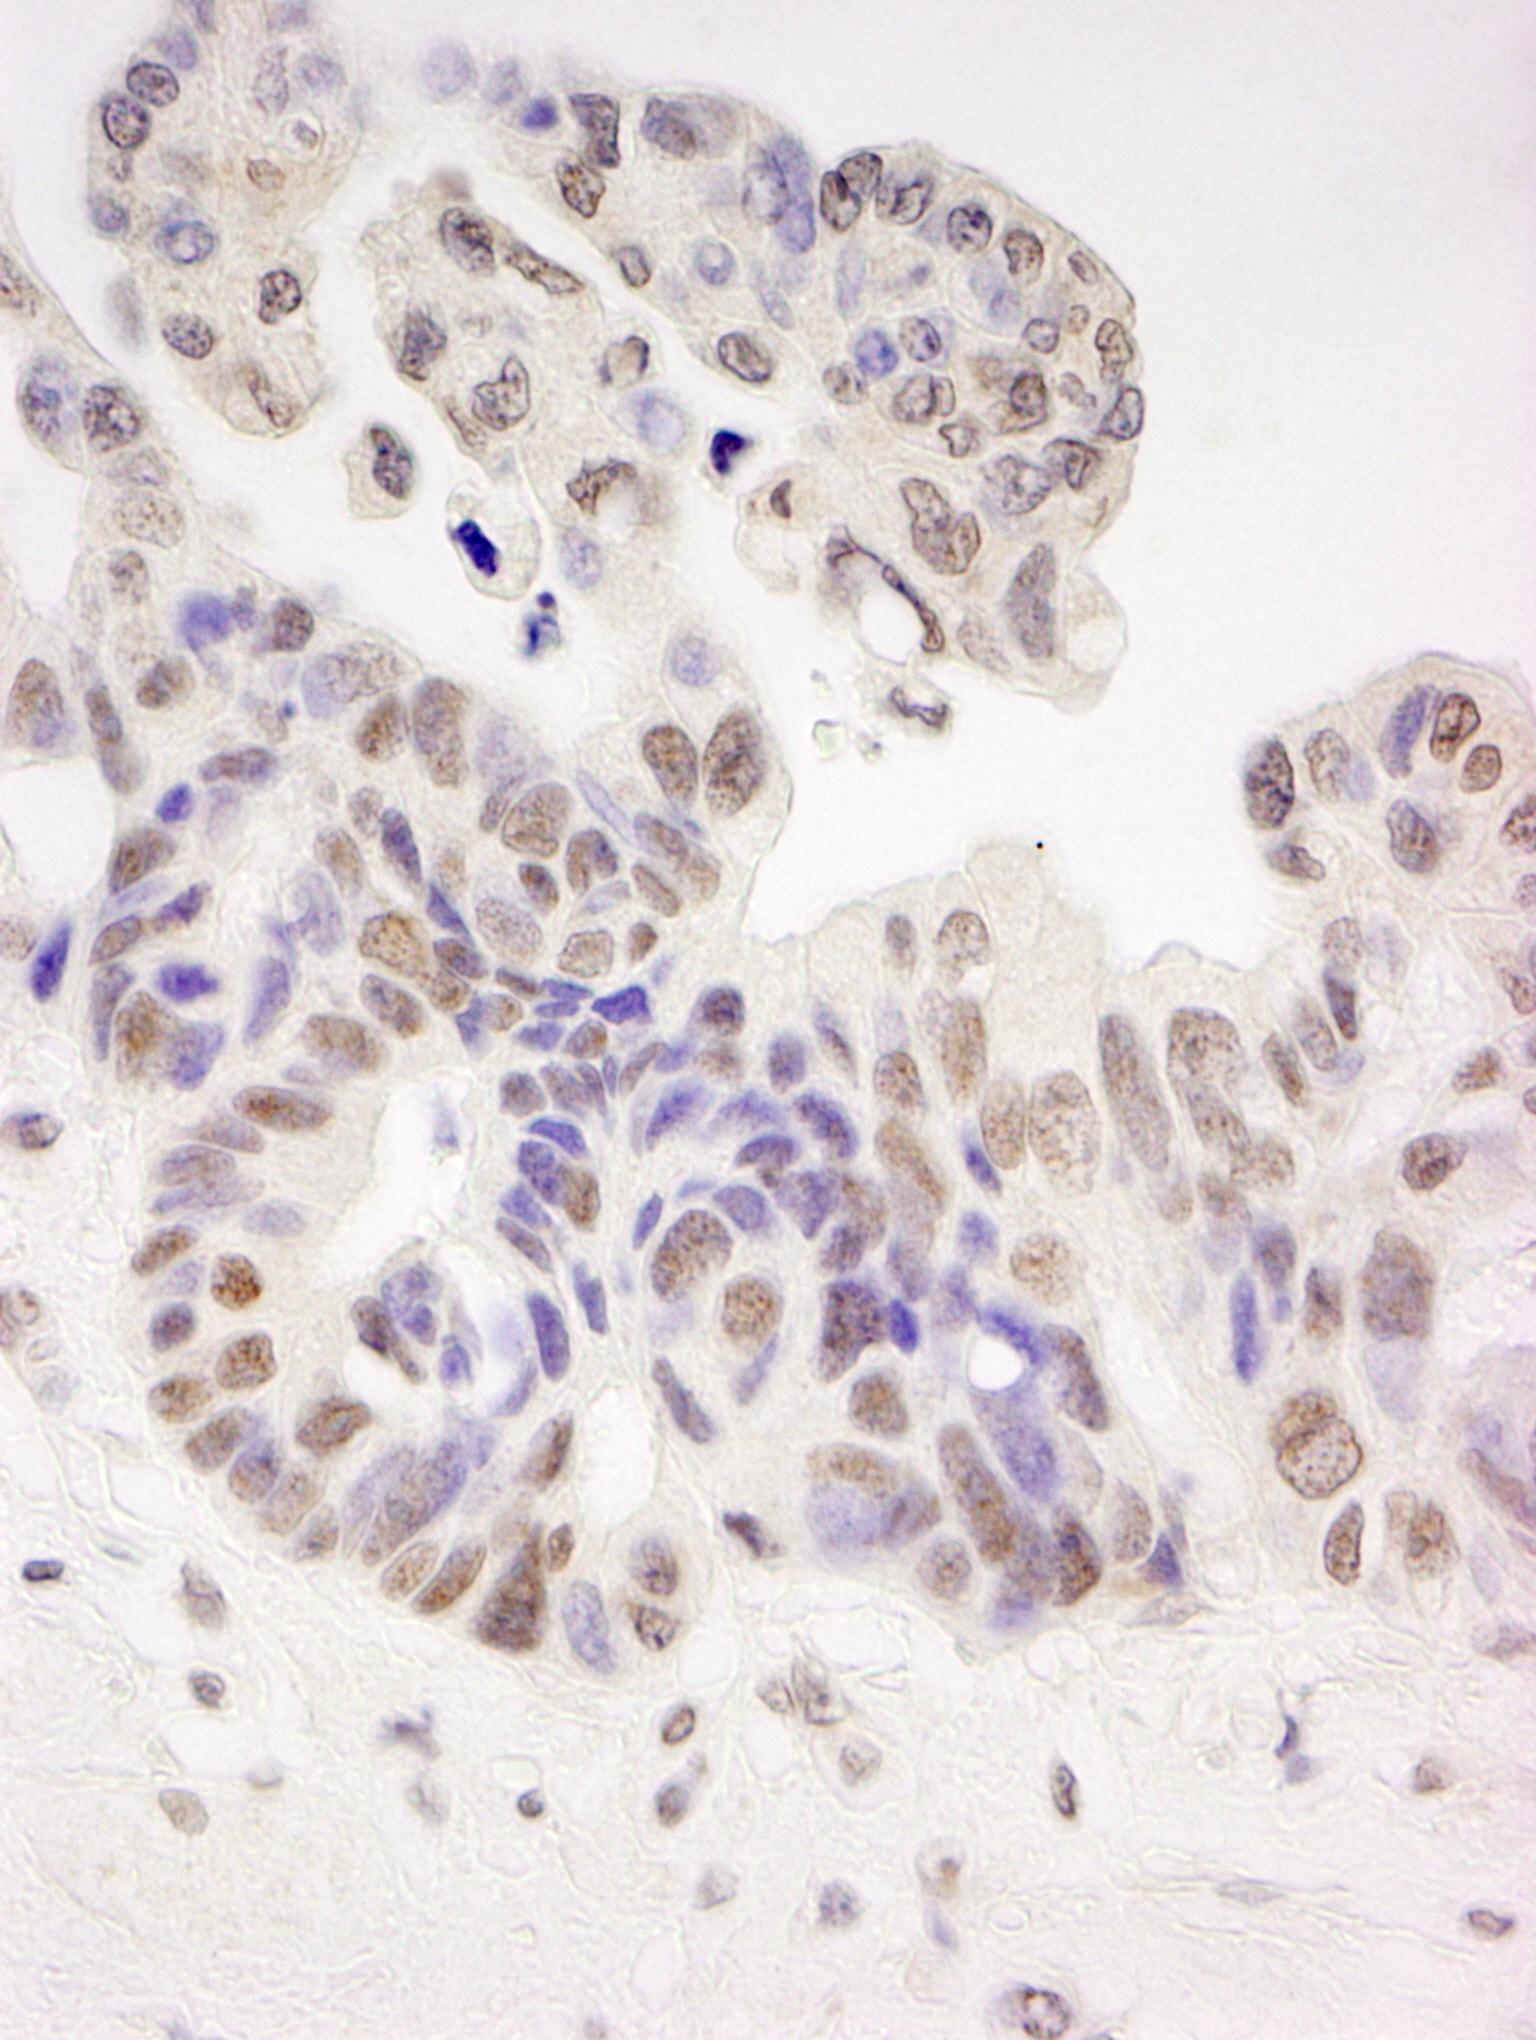 Tat-SF1 Antibody in Immunohistochemistry (IHC)